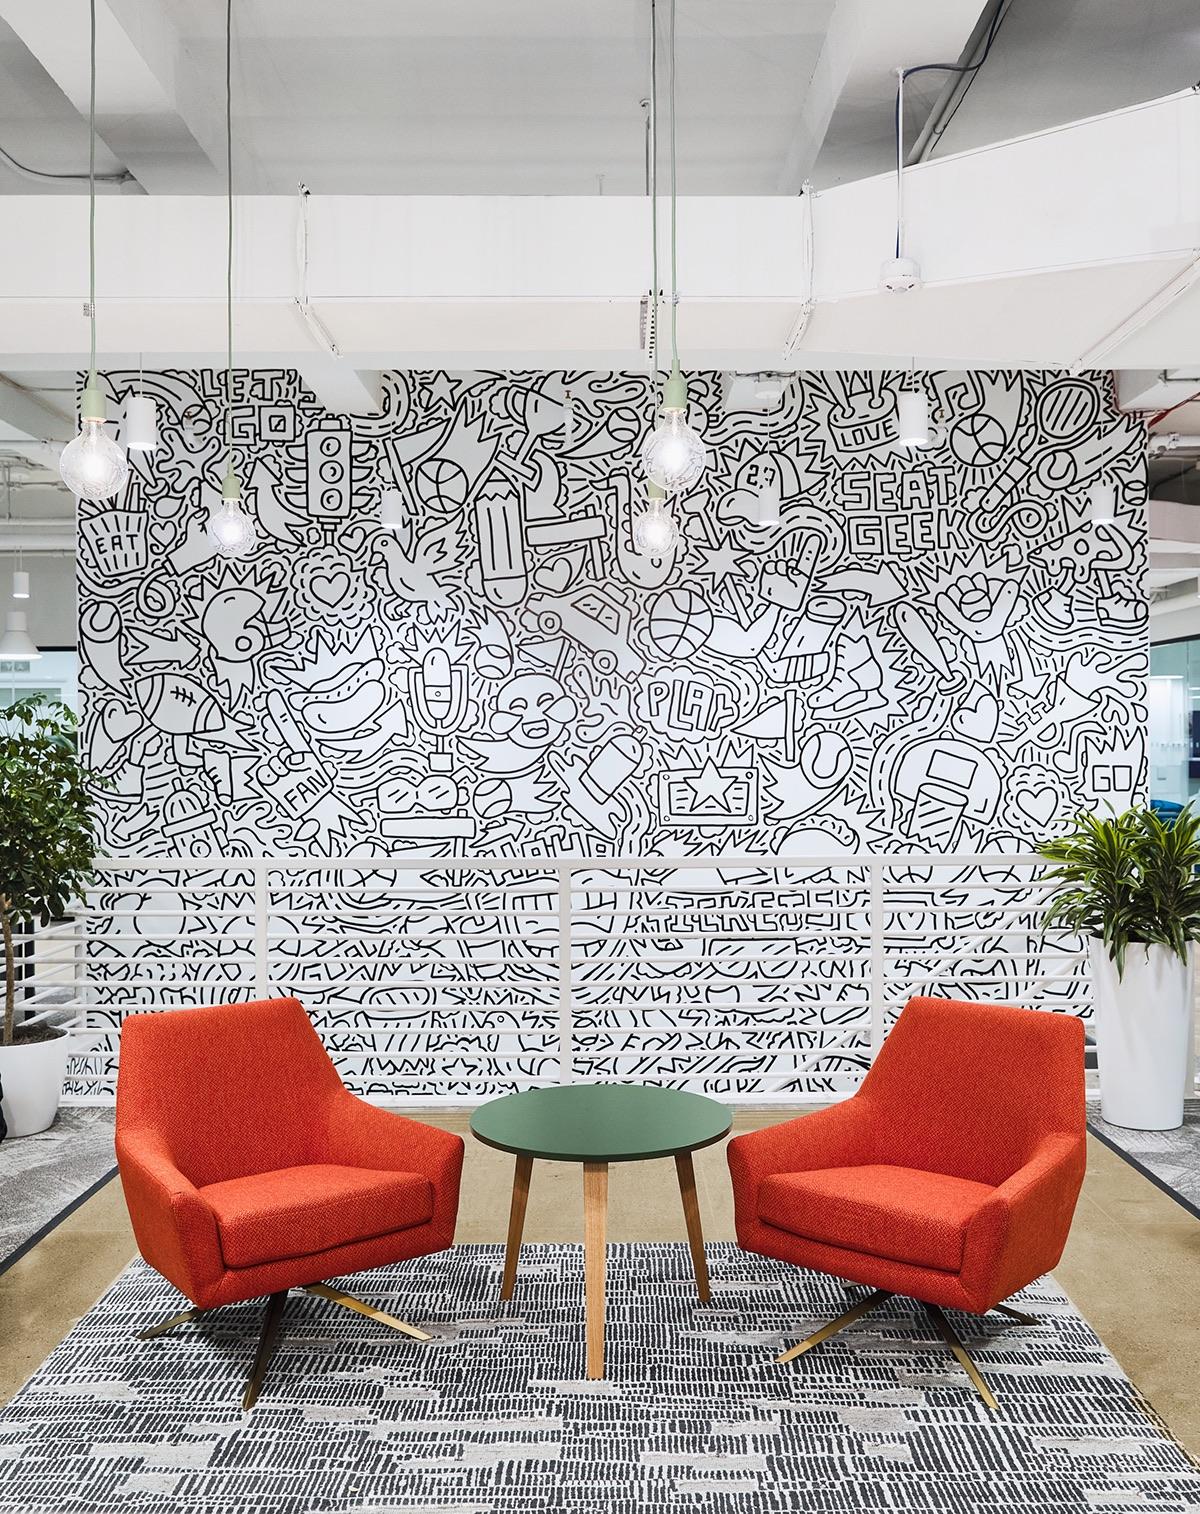 seatgeek-nyc-office-12